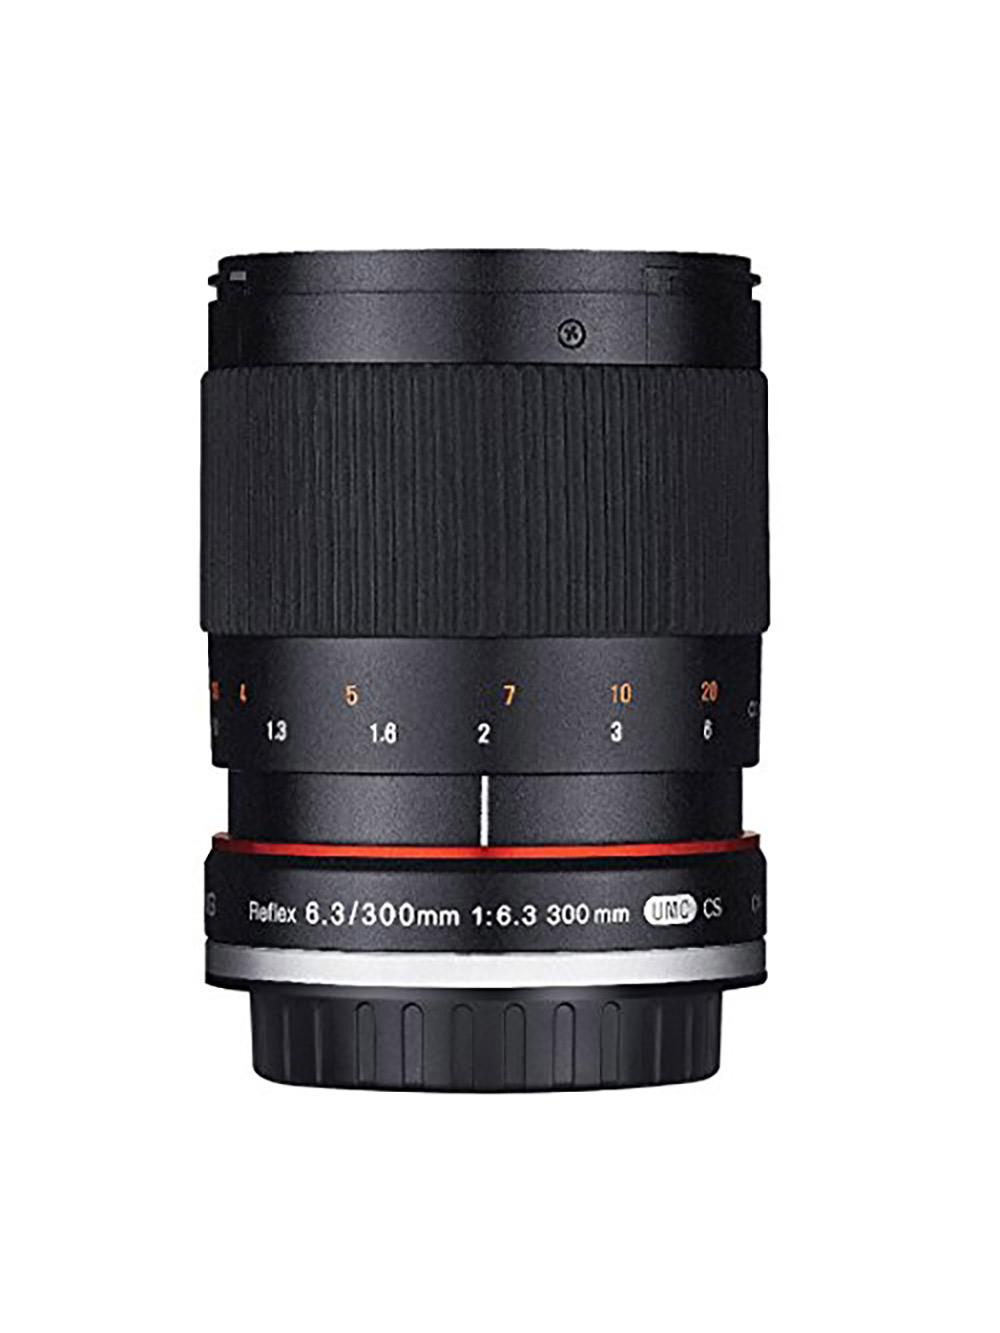 Samyang SY300M-FX-S 300mm F6.3 Mirror Lens for Fuji X Mirrorless Interchangeable Lens Cameras